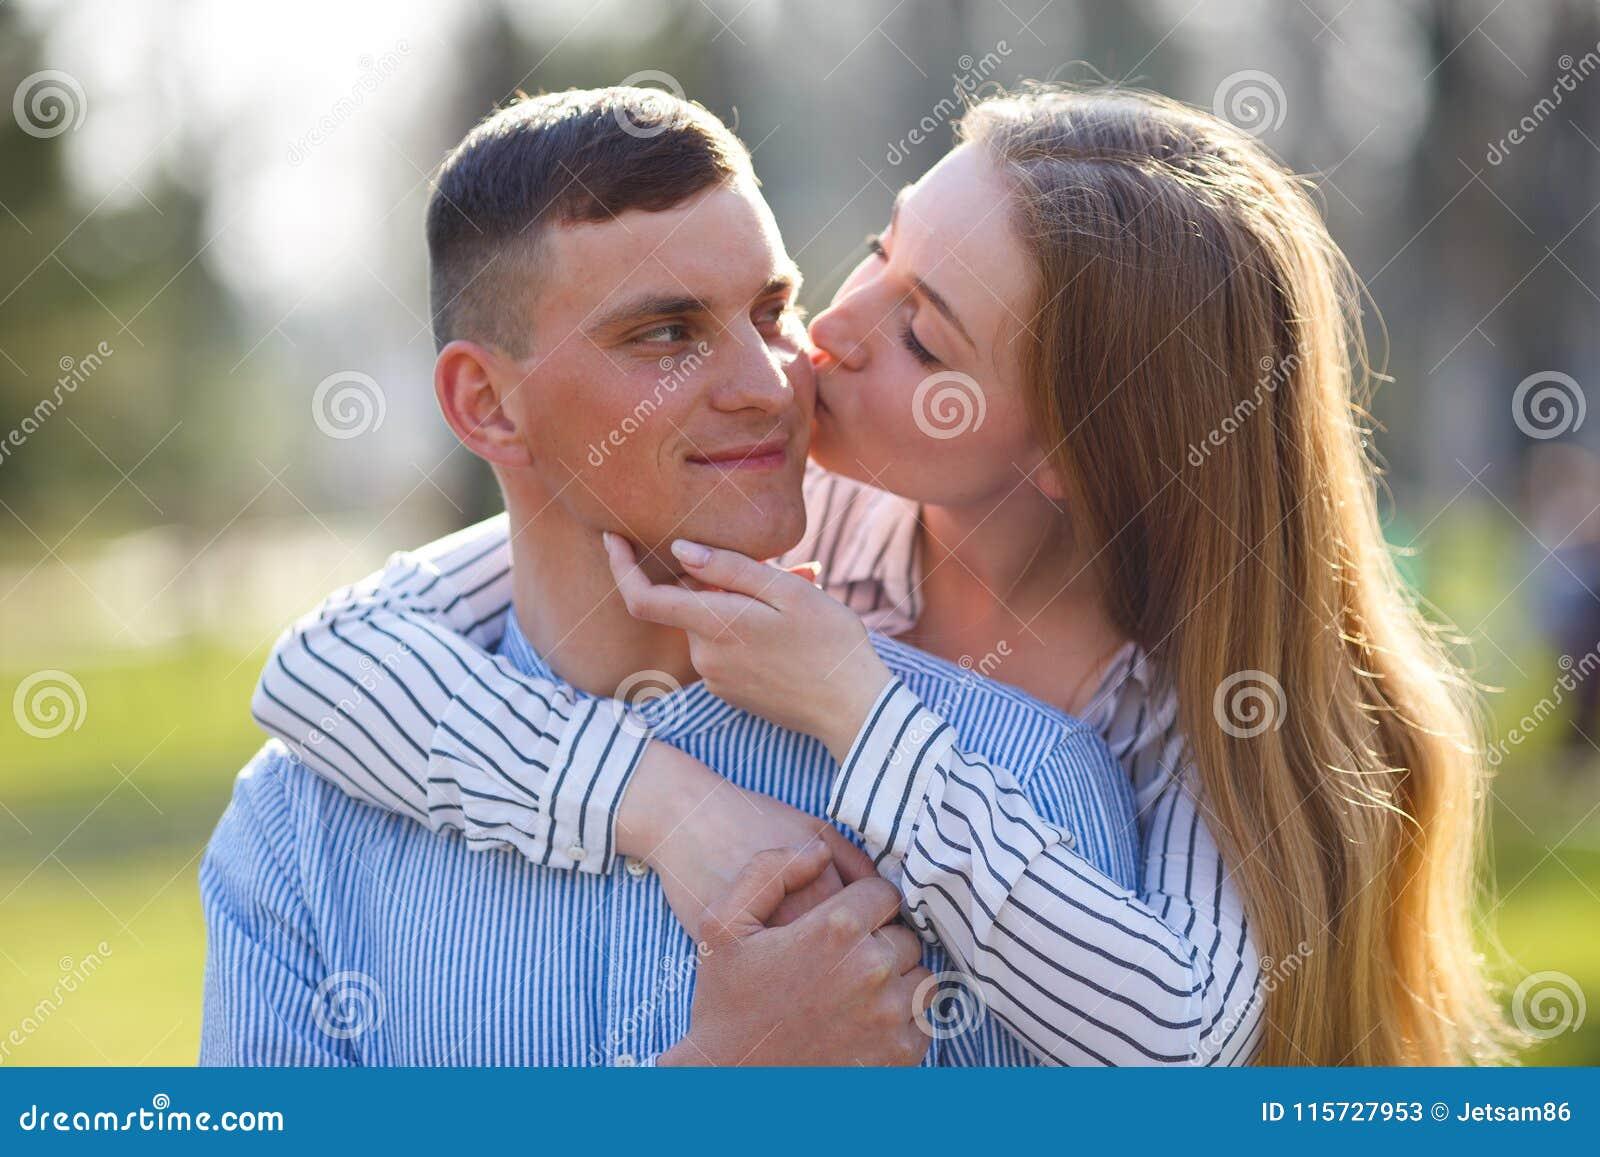 how to enjoy kissing your boyfriend